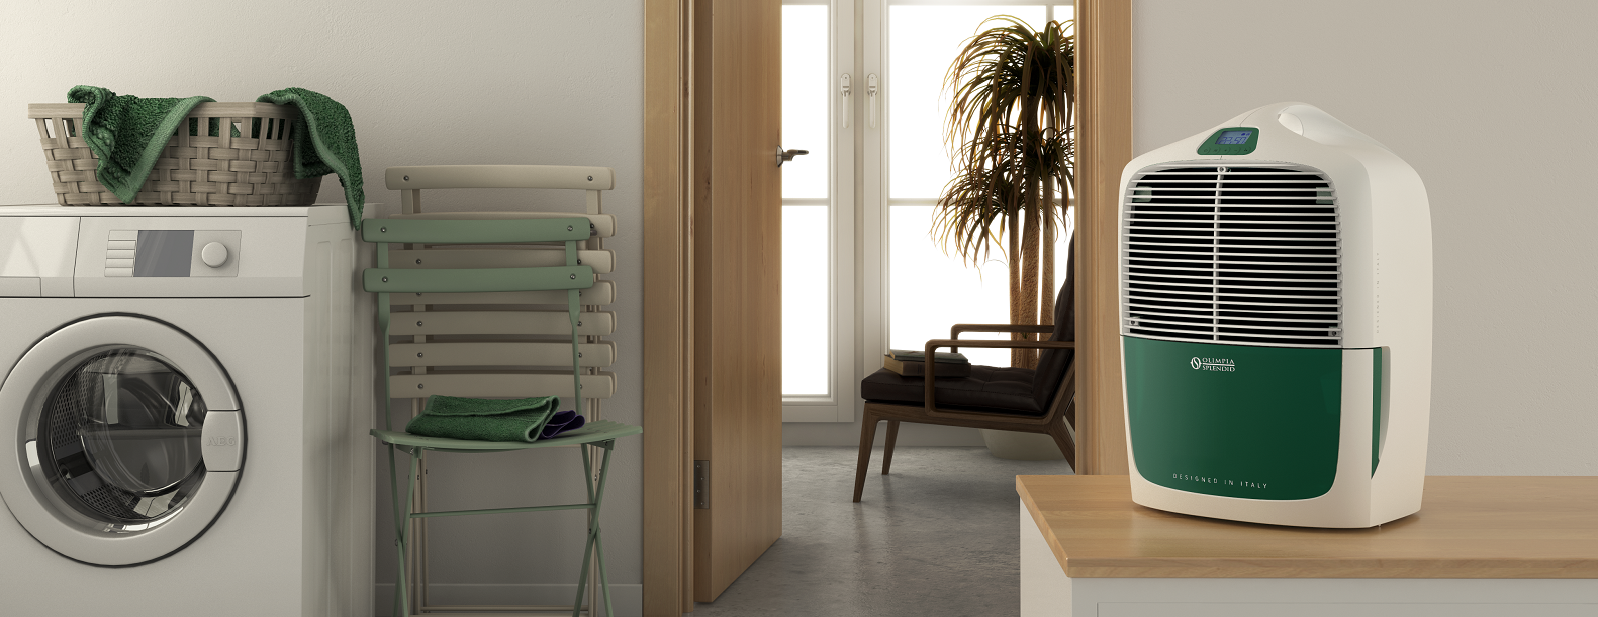 aquaria 16 olimpia splendid. Black Bedroom Furniture Sets. Home Design Ideas